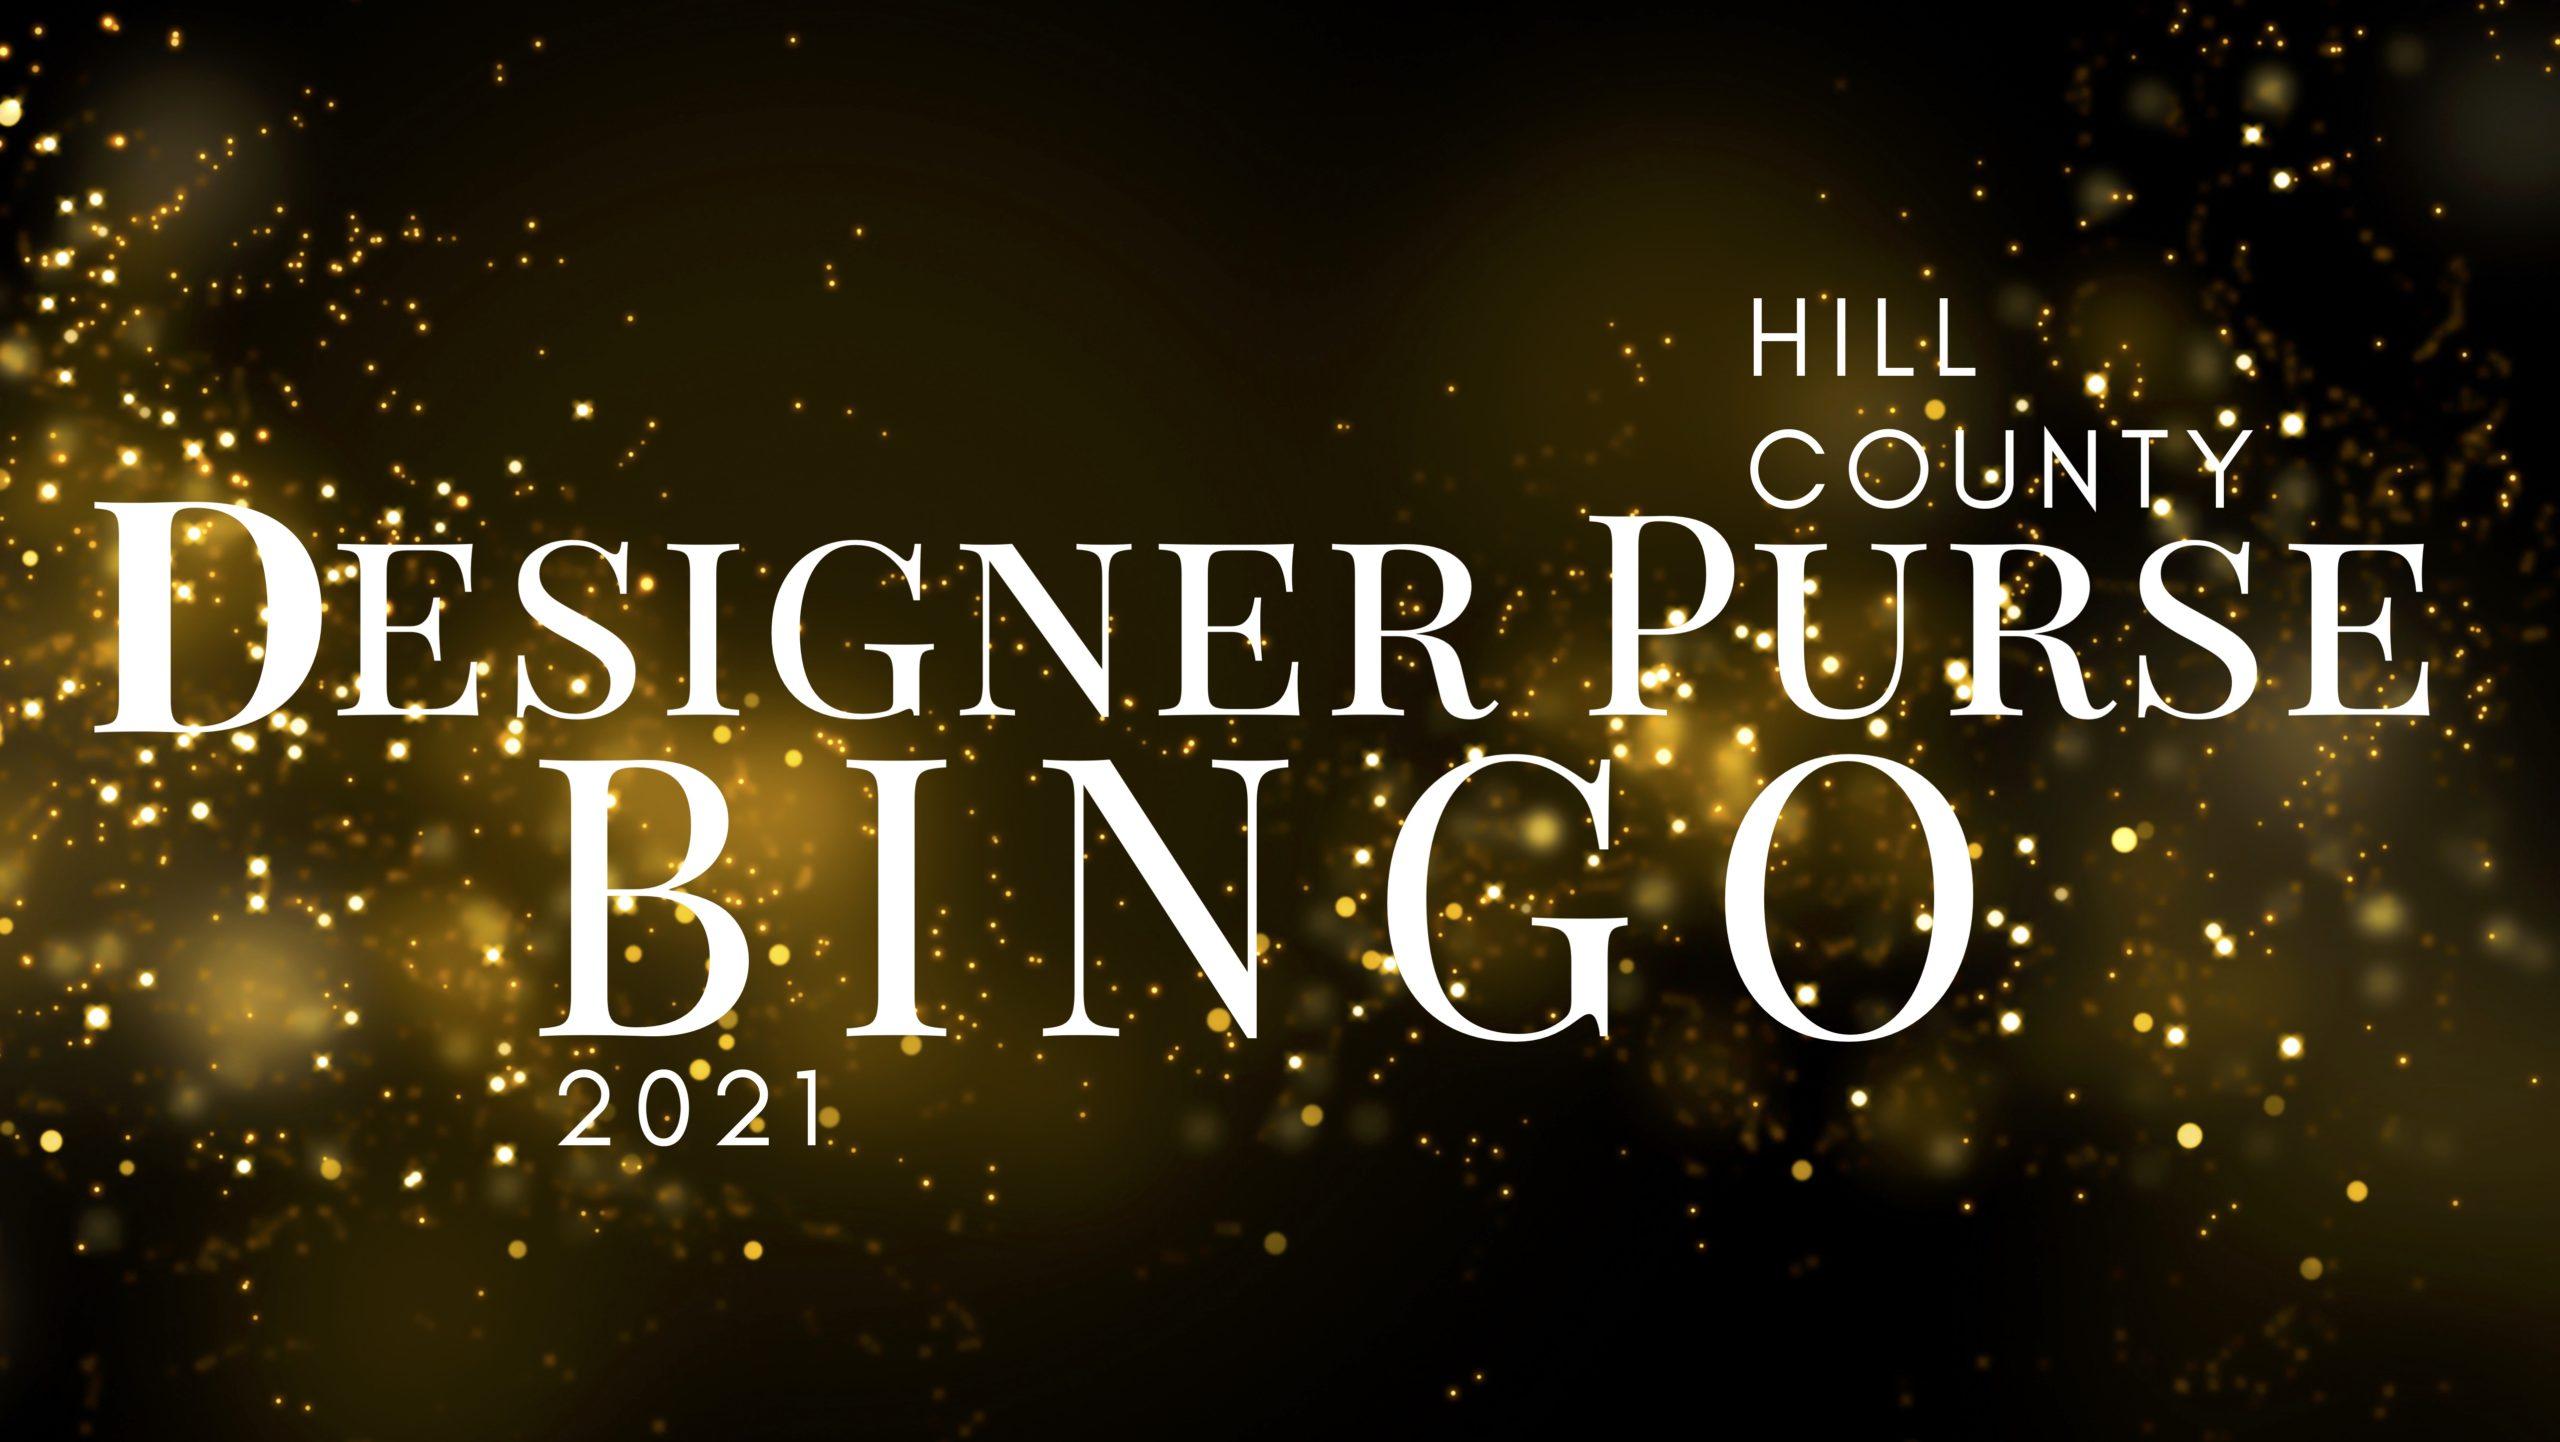 Bingo - Hill County 2021 Graphics